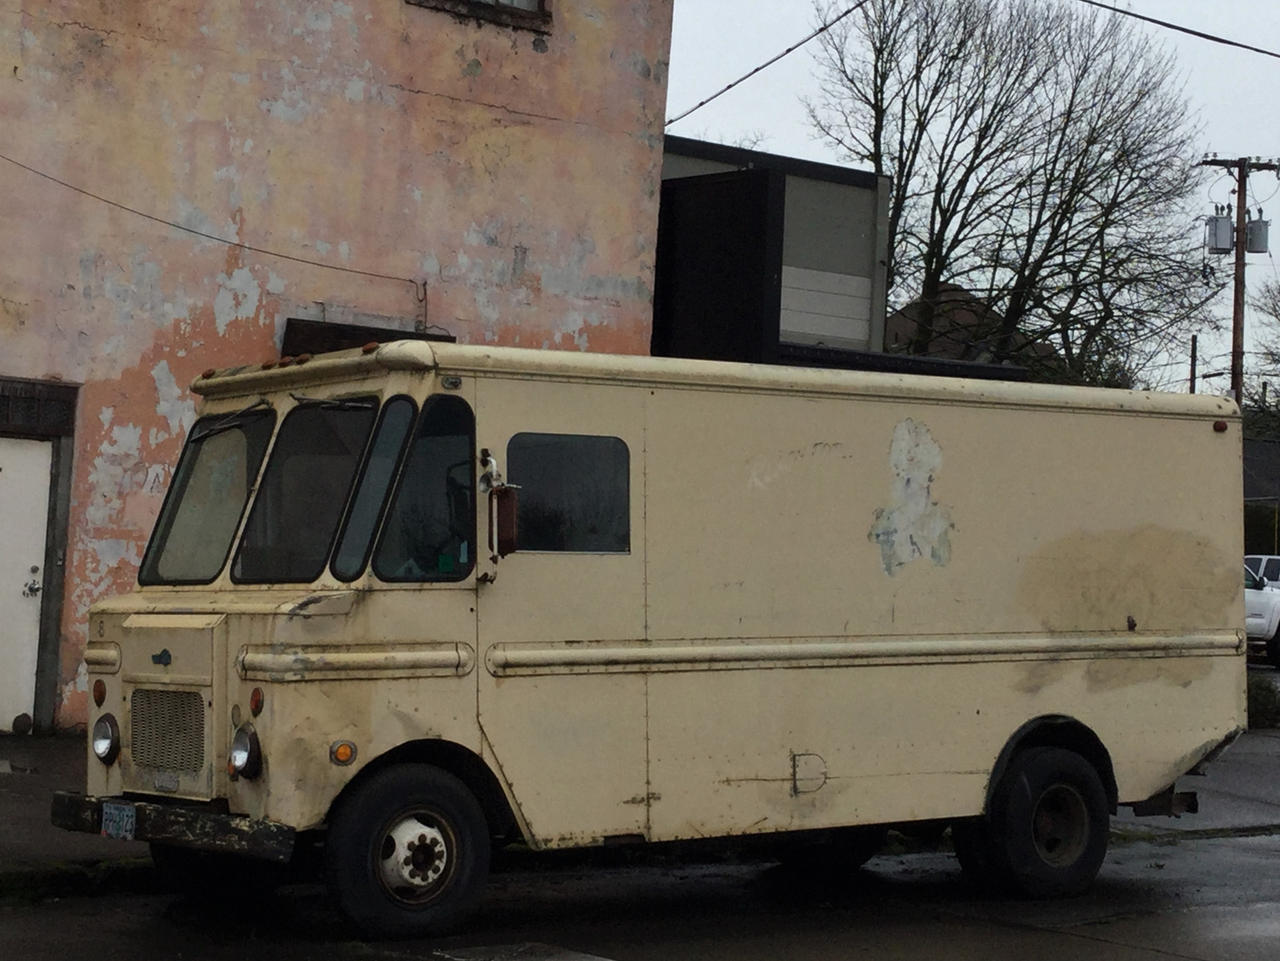 1960s Ford Kurb-Van by Grumman Olson by humloch on DeviantArt